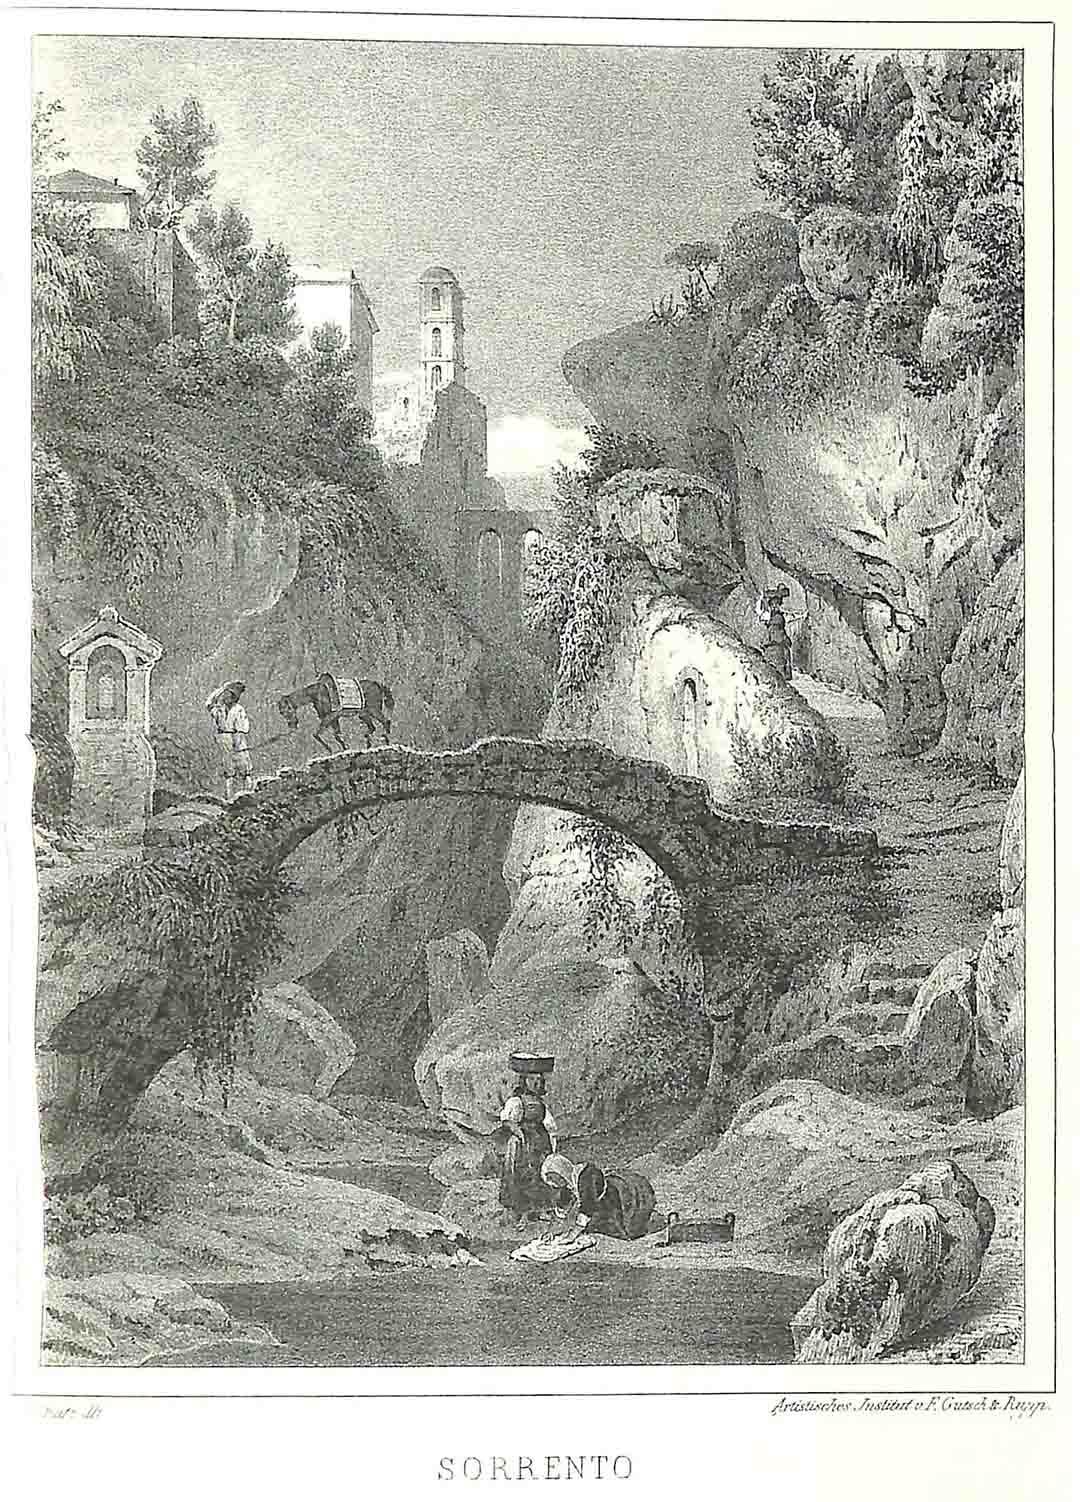 J. SCHULZ, Sorrento, ca. 1850